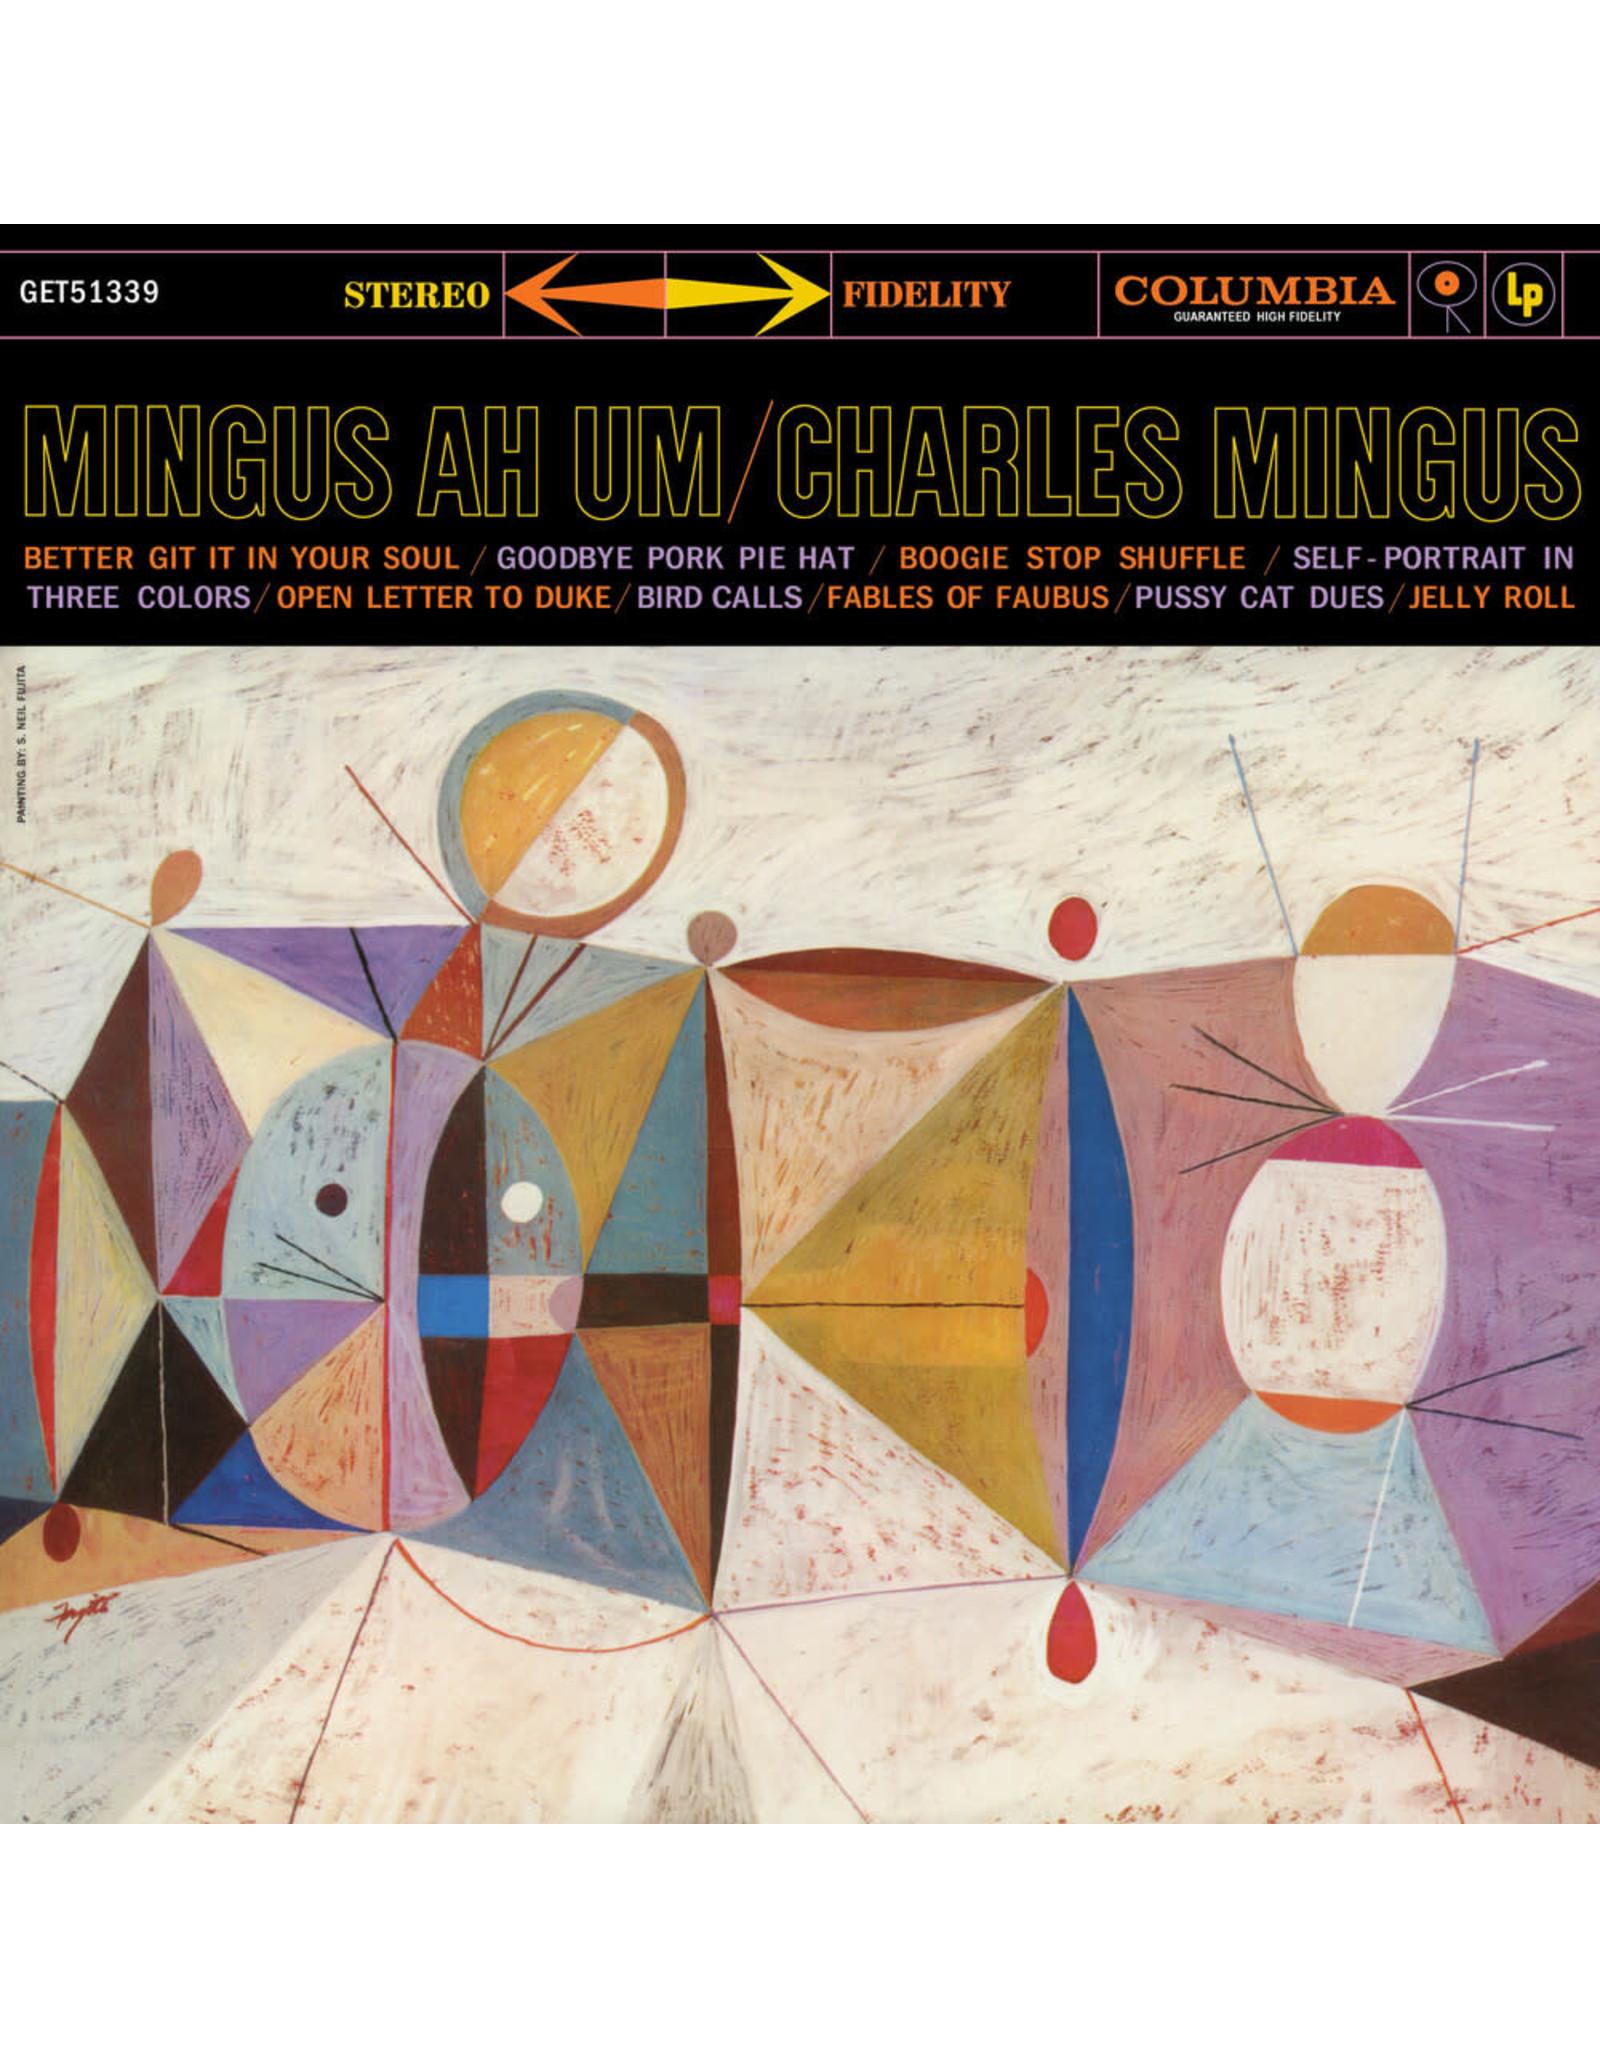 Charles Mingus - Mingus Ah Um (60th Anniversary) [Expanded]